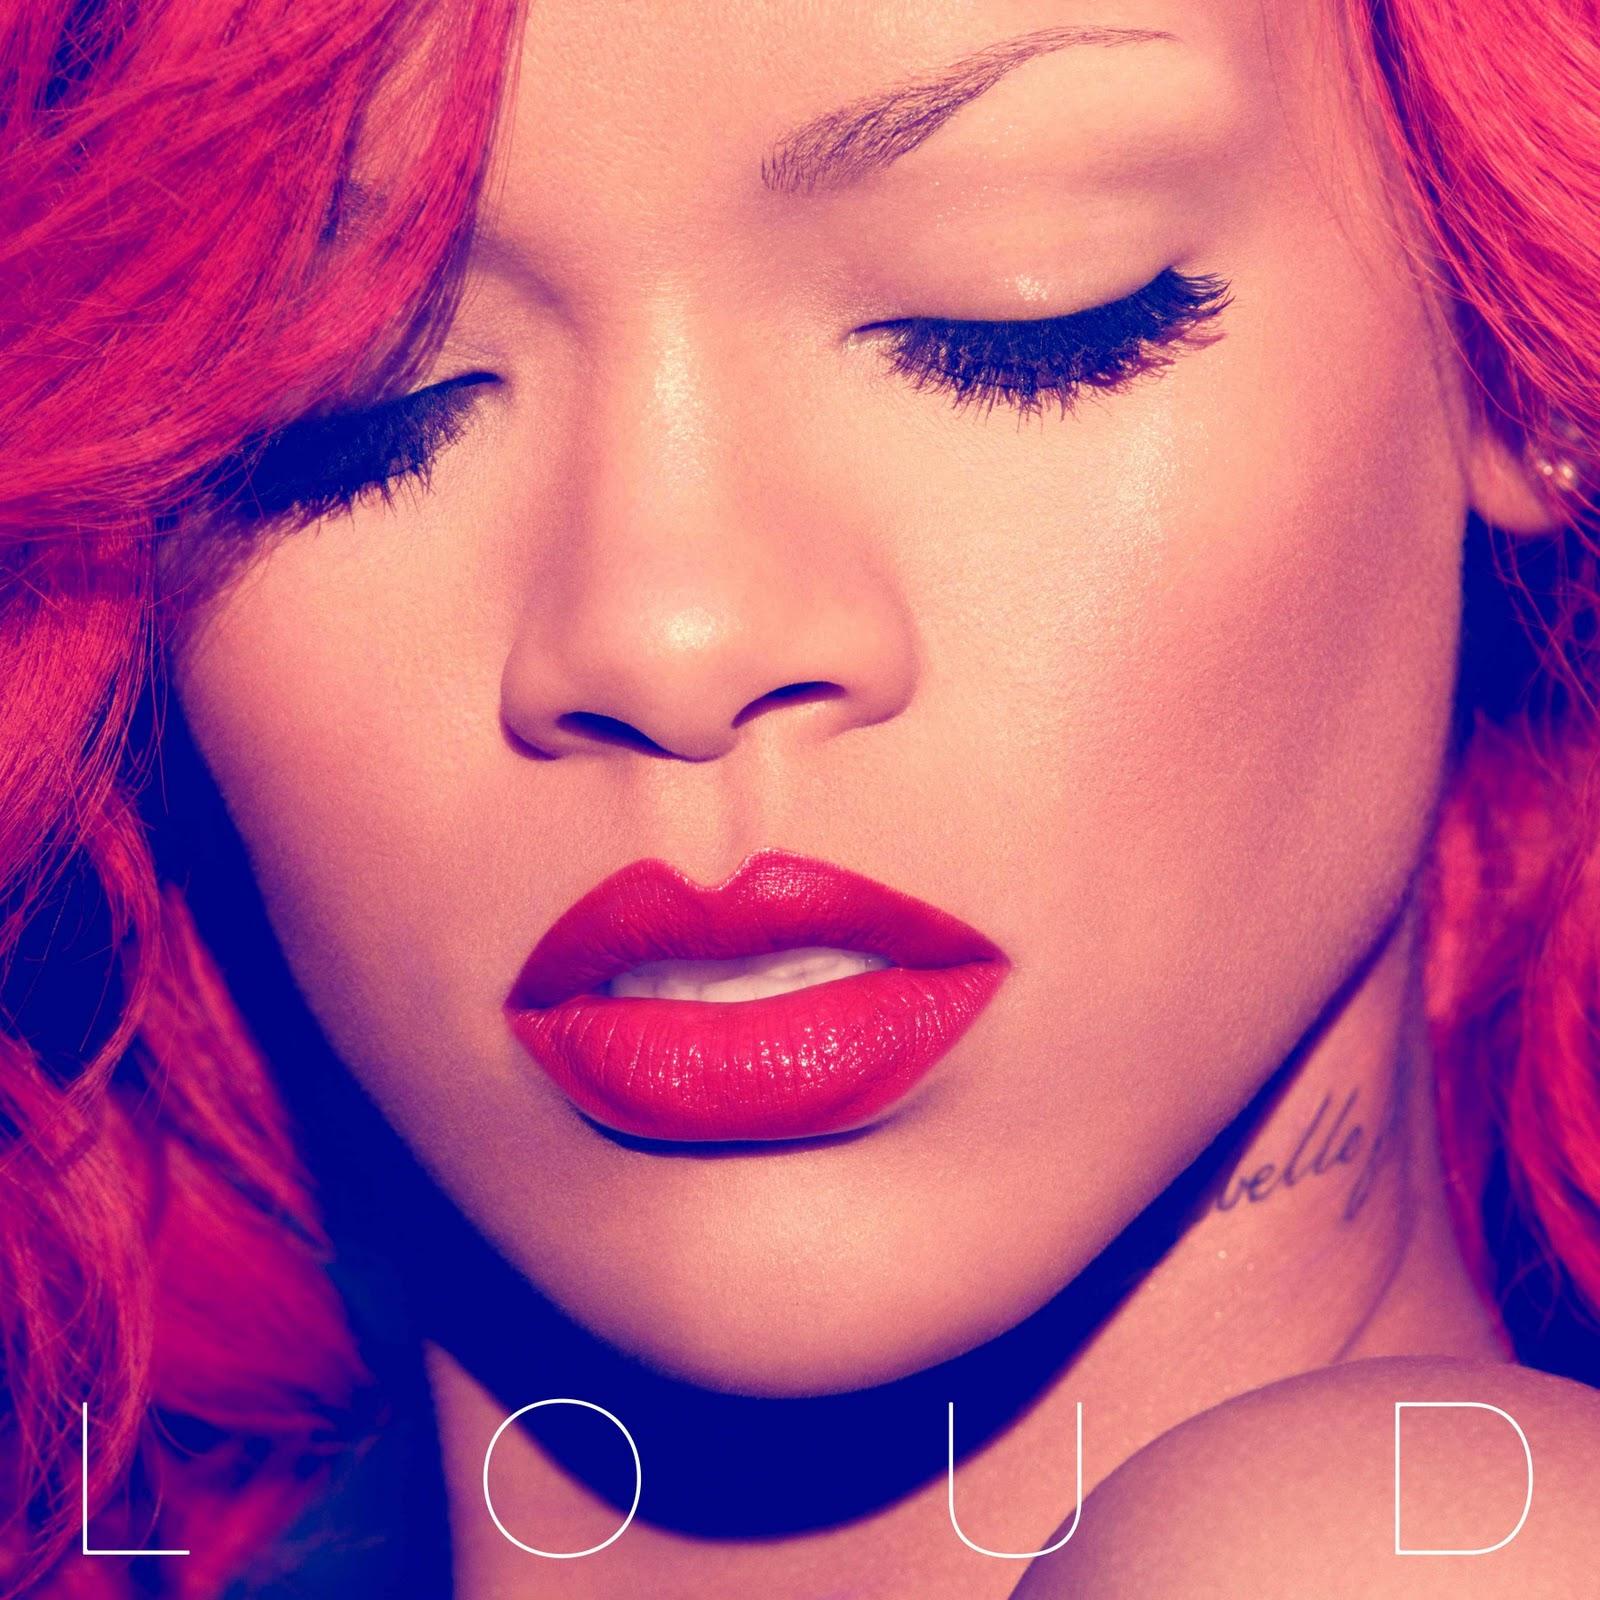 http://2.bp.blogspot.com/_HotHrwngMIM/TO29G_6TzAI/AAAAAAAAAAM/6Wxj8i-WUL8/s1600/Rihanna-Loud-Album-Cover.jpg